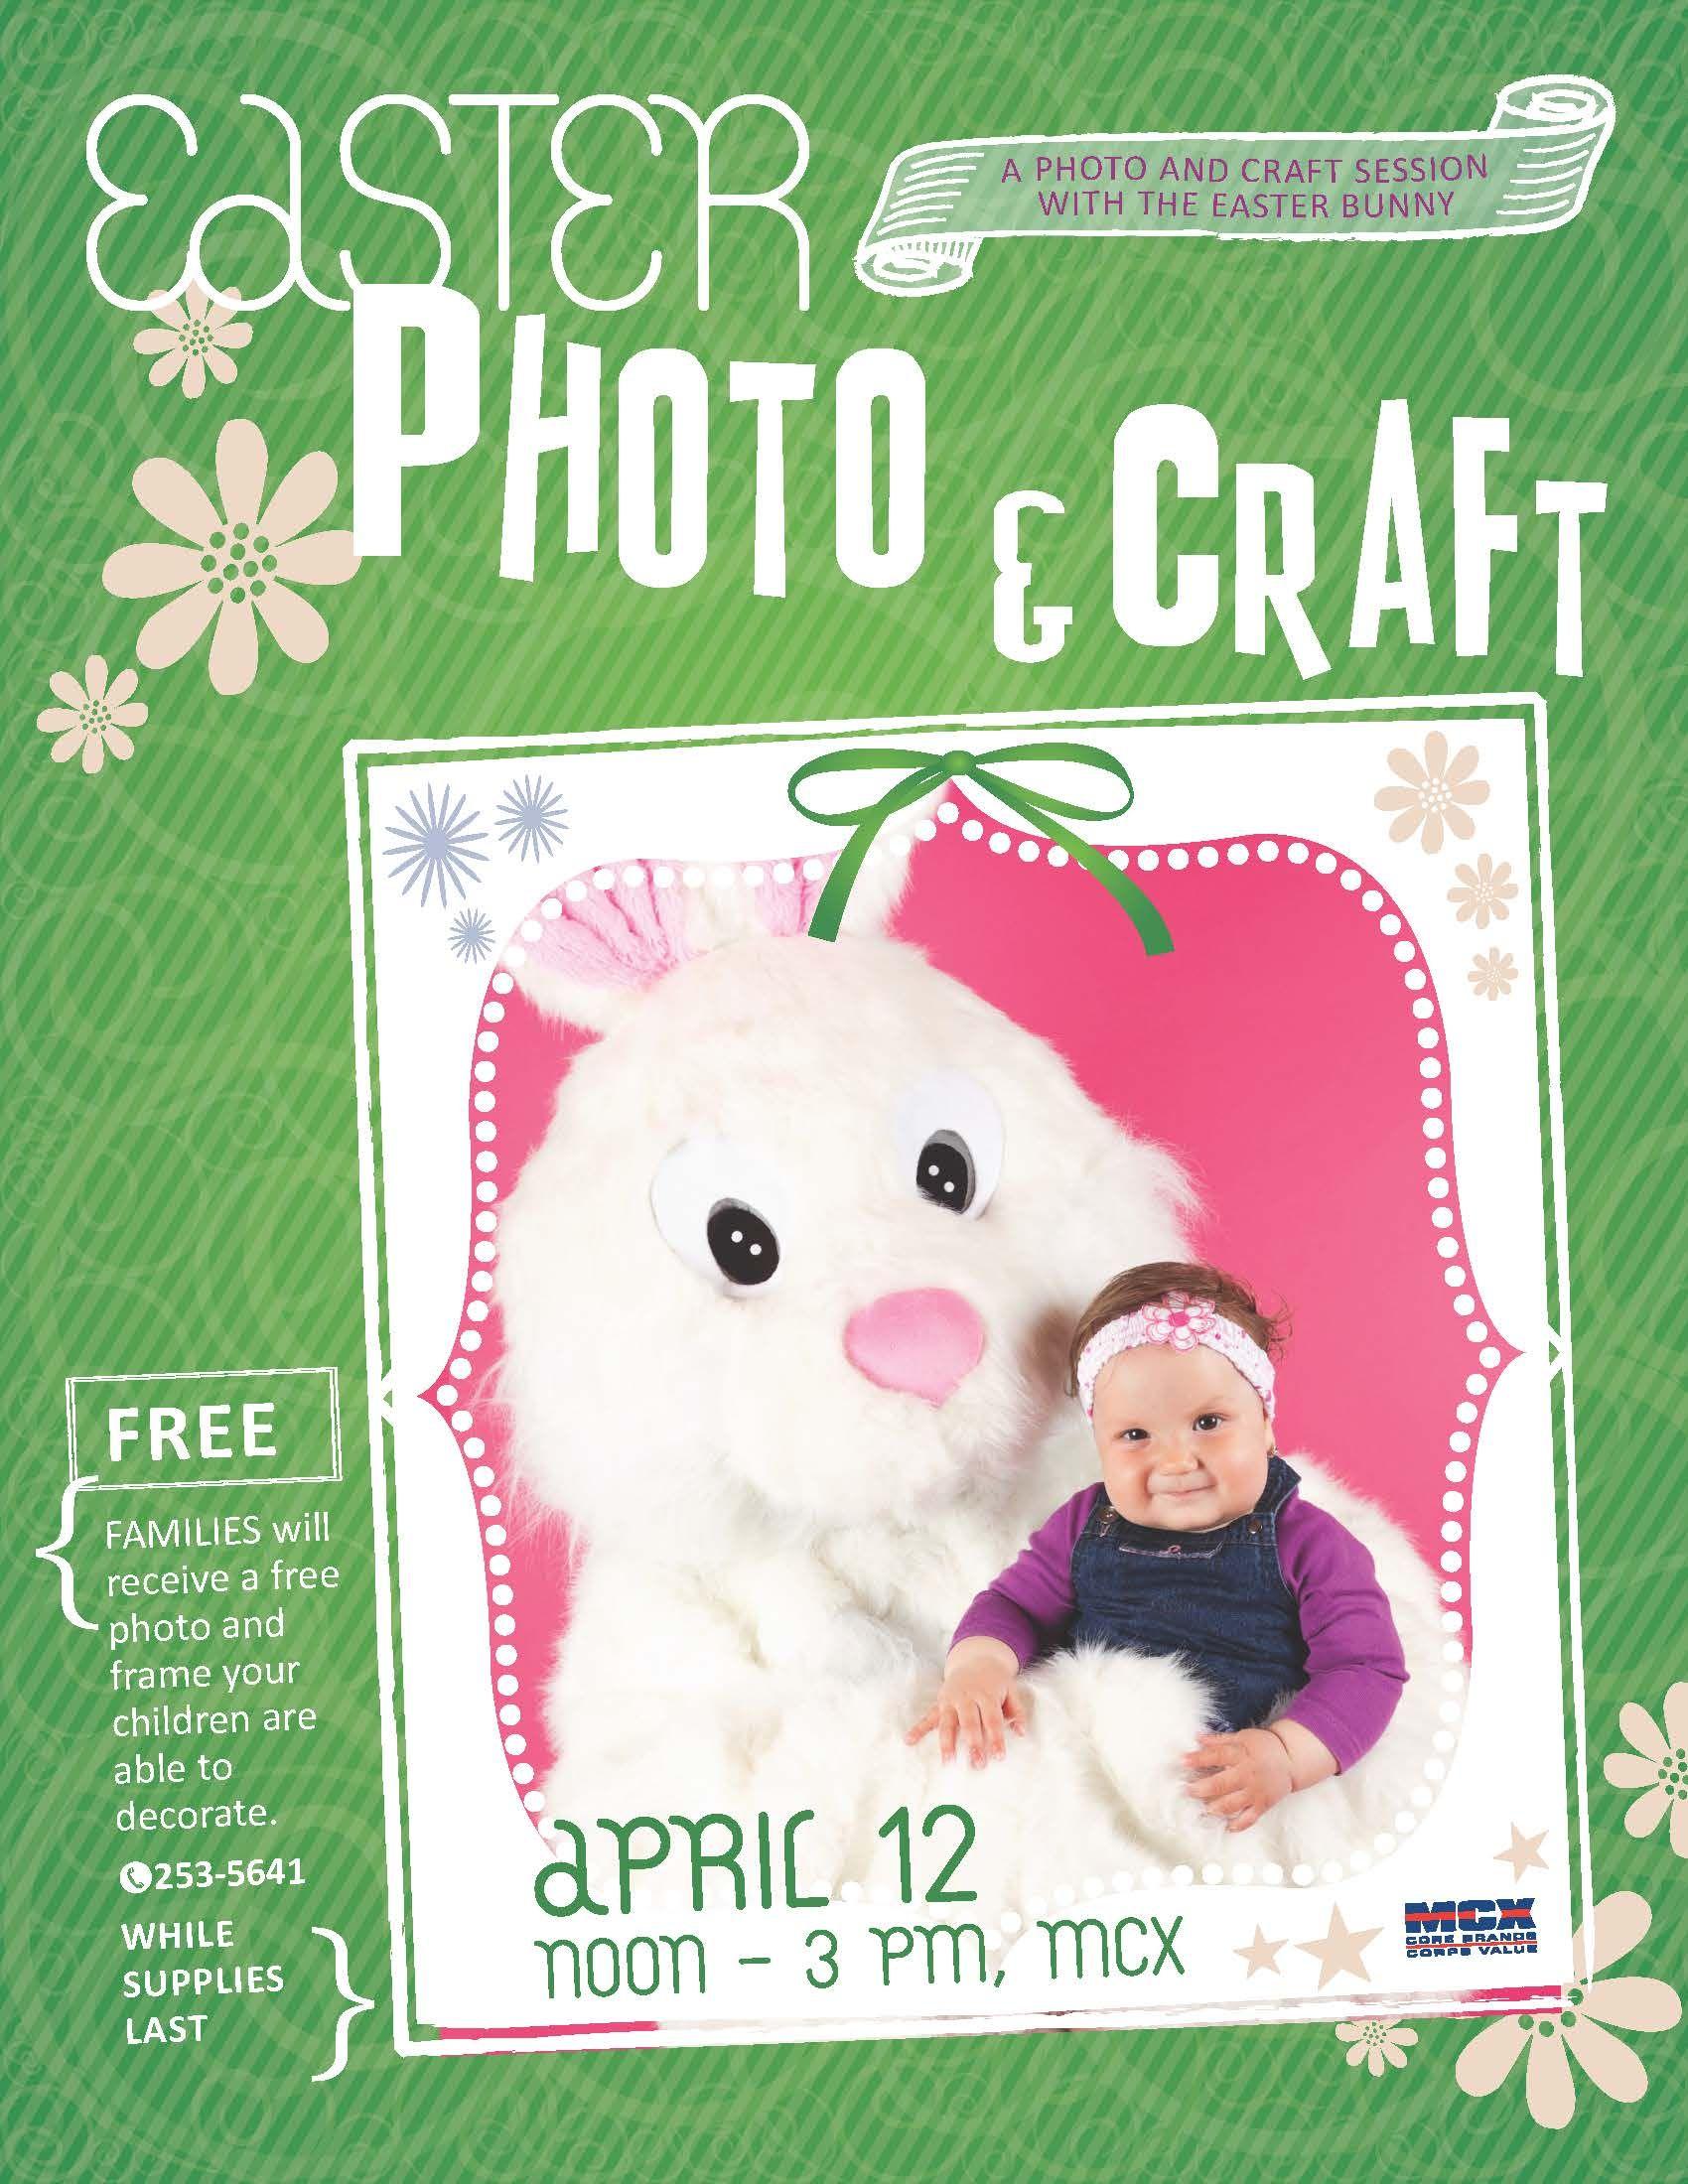 Easter Photo & Craft Event | MCCS Iwakuni Events | Photo